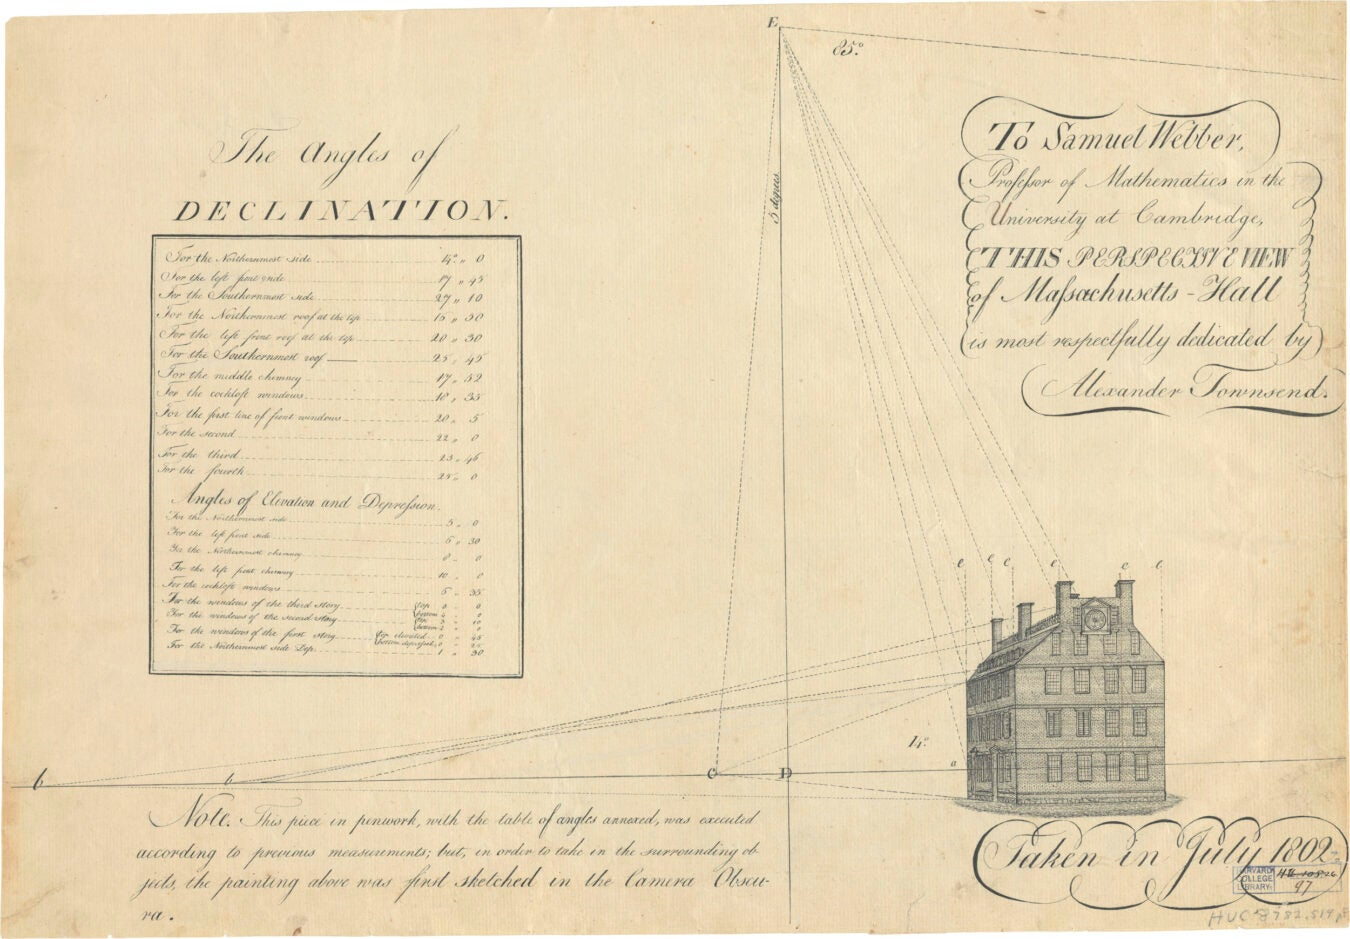 Sketch Mass Hall clock, 1802.